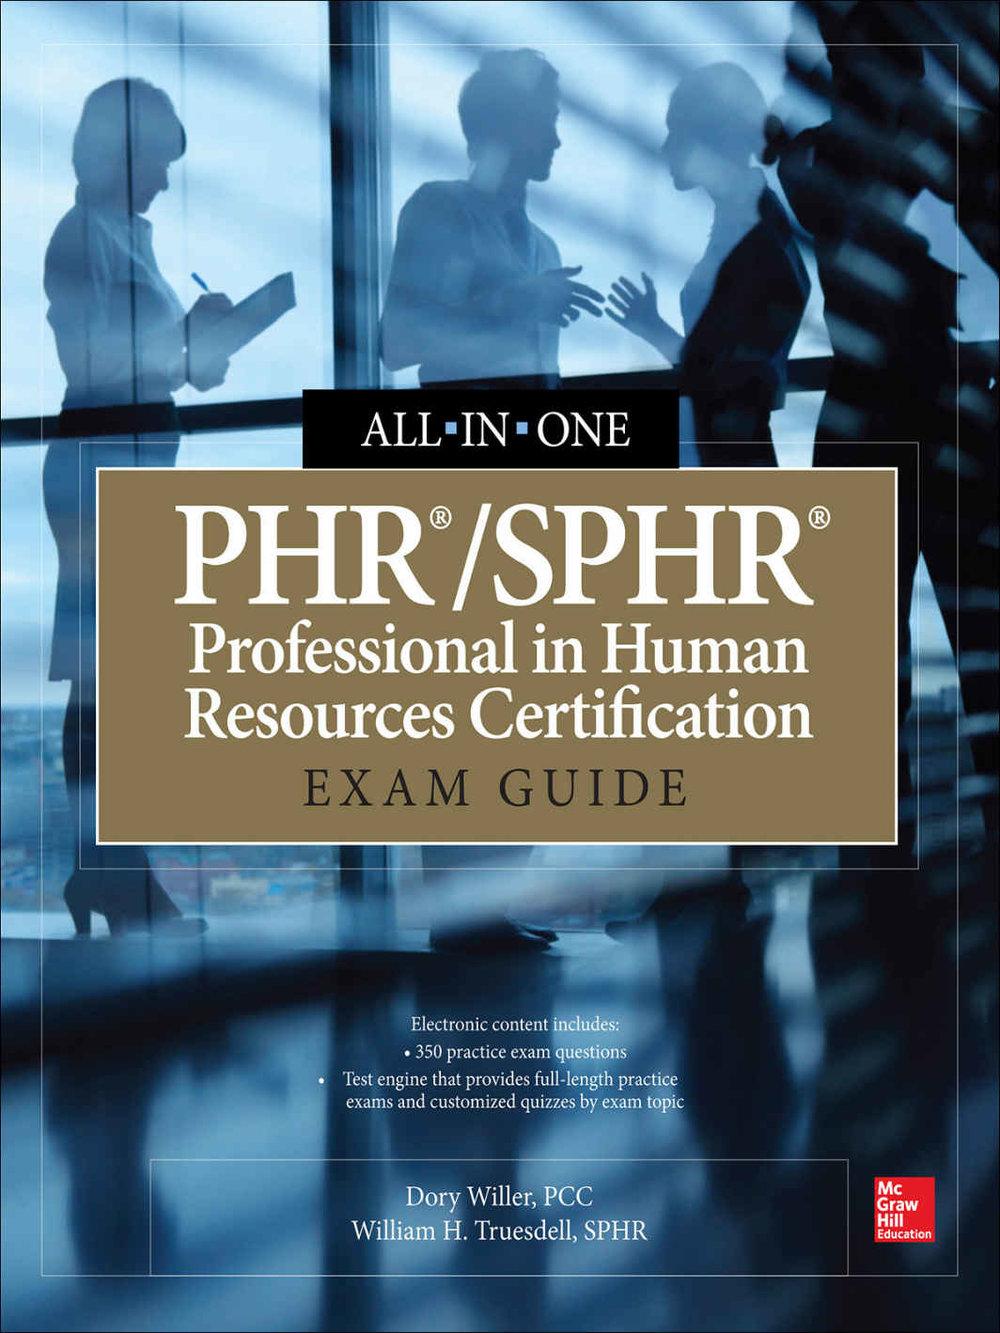 PHR SPHR Cover.jpg